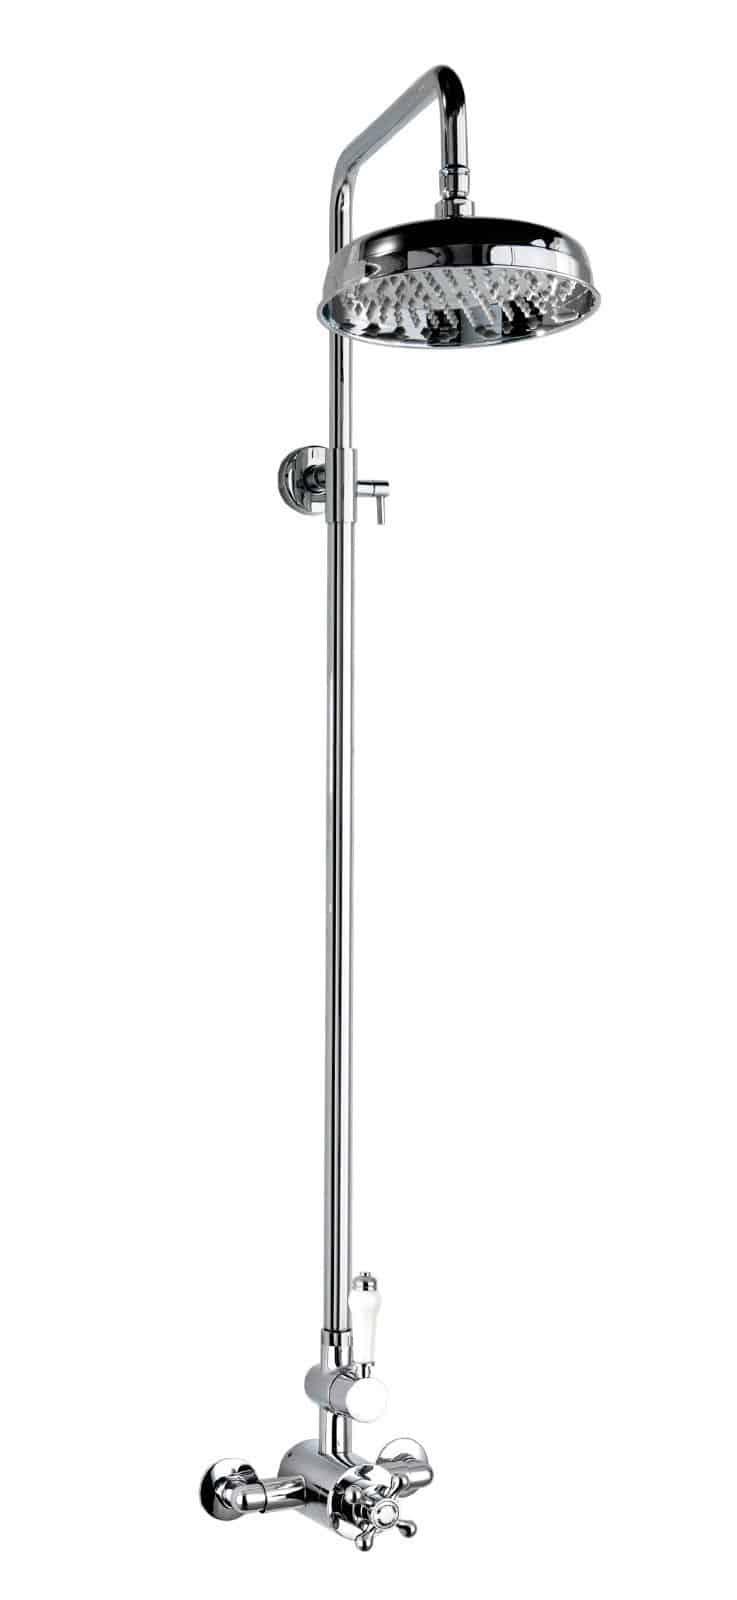 Cassellie Deluge Traditional Rigid Riser Shower Kit Delk001 Cheeky Bathrooms